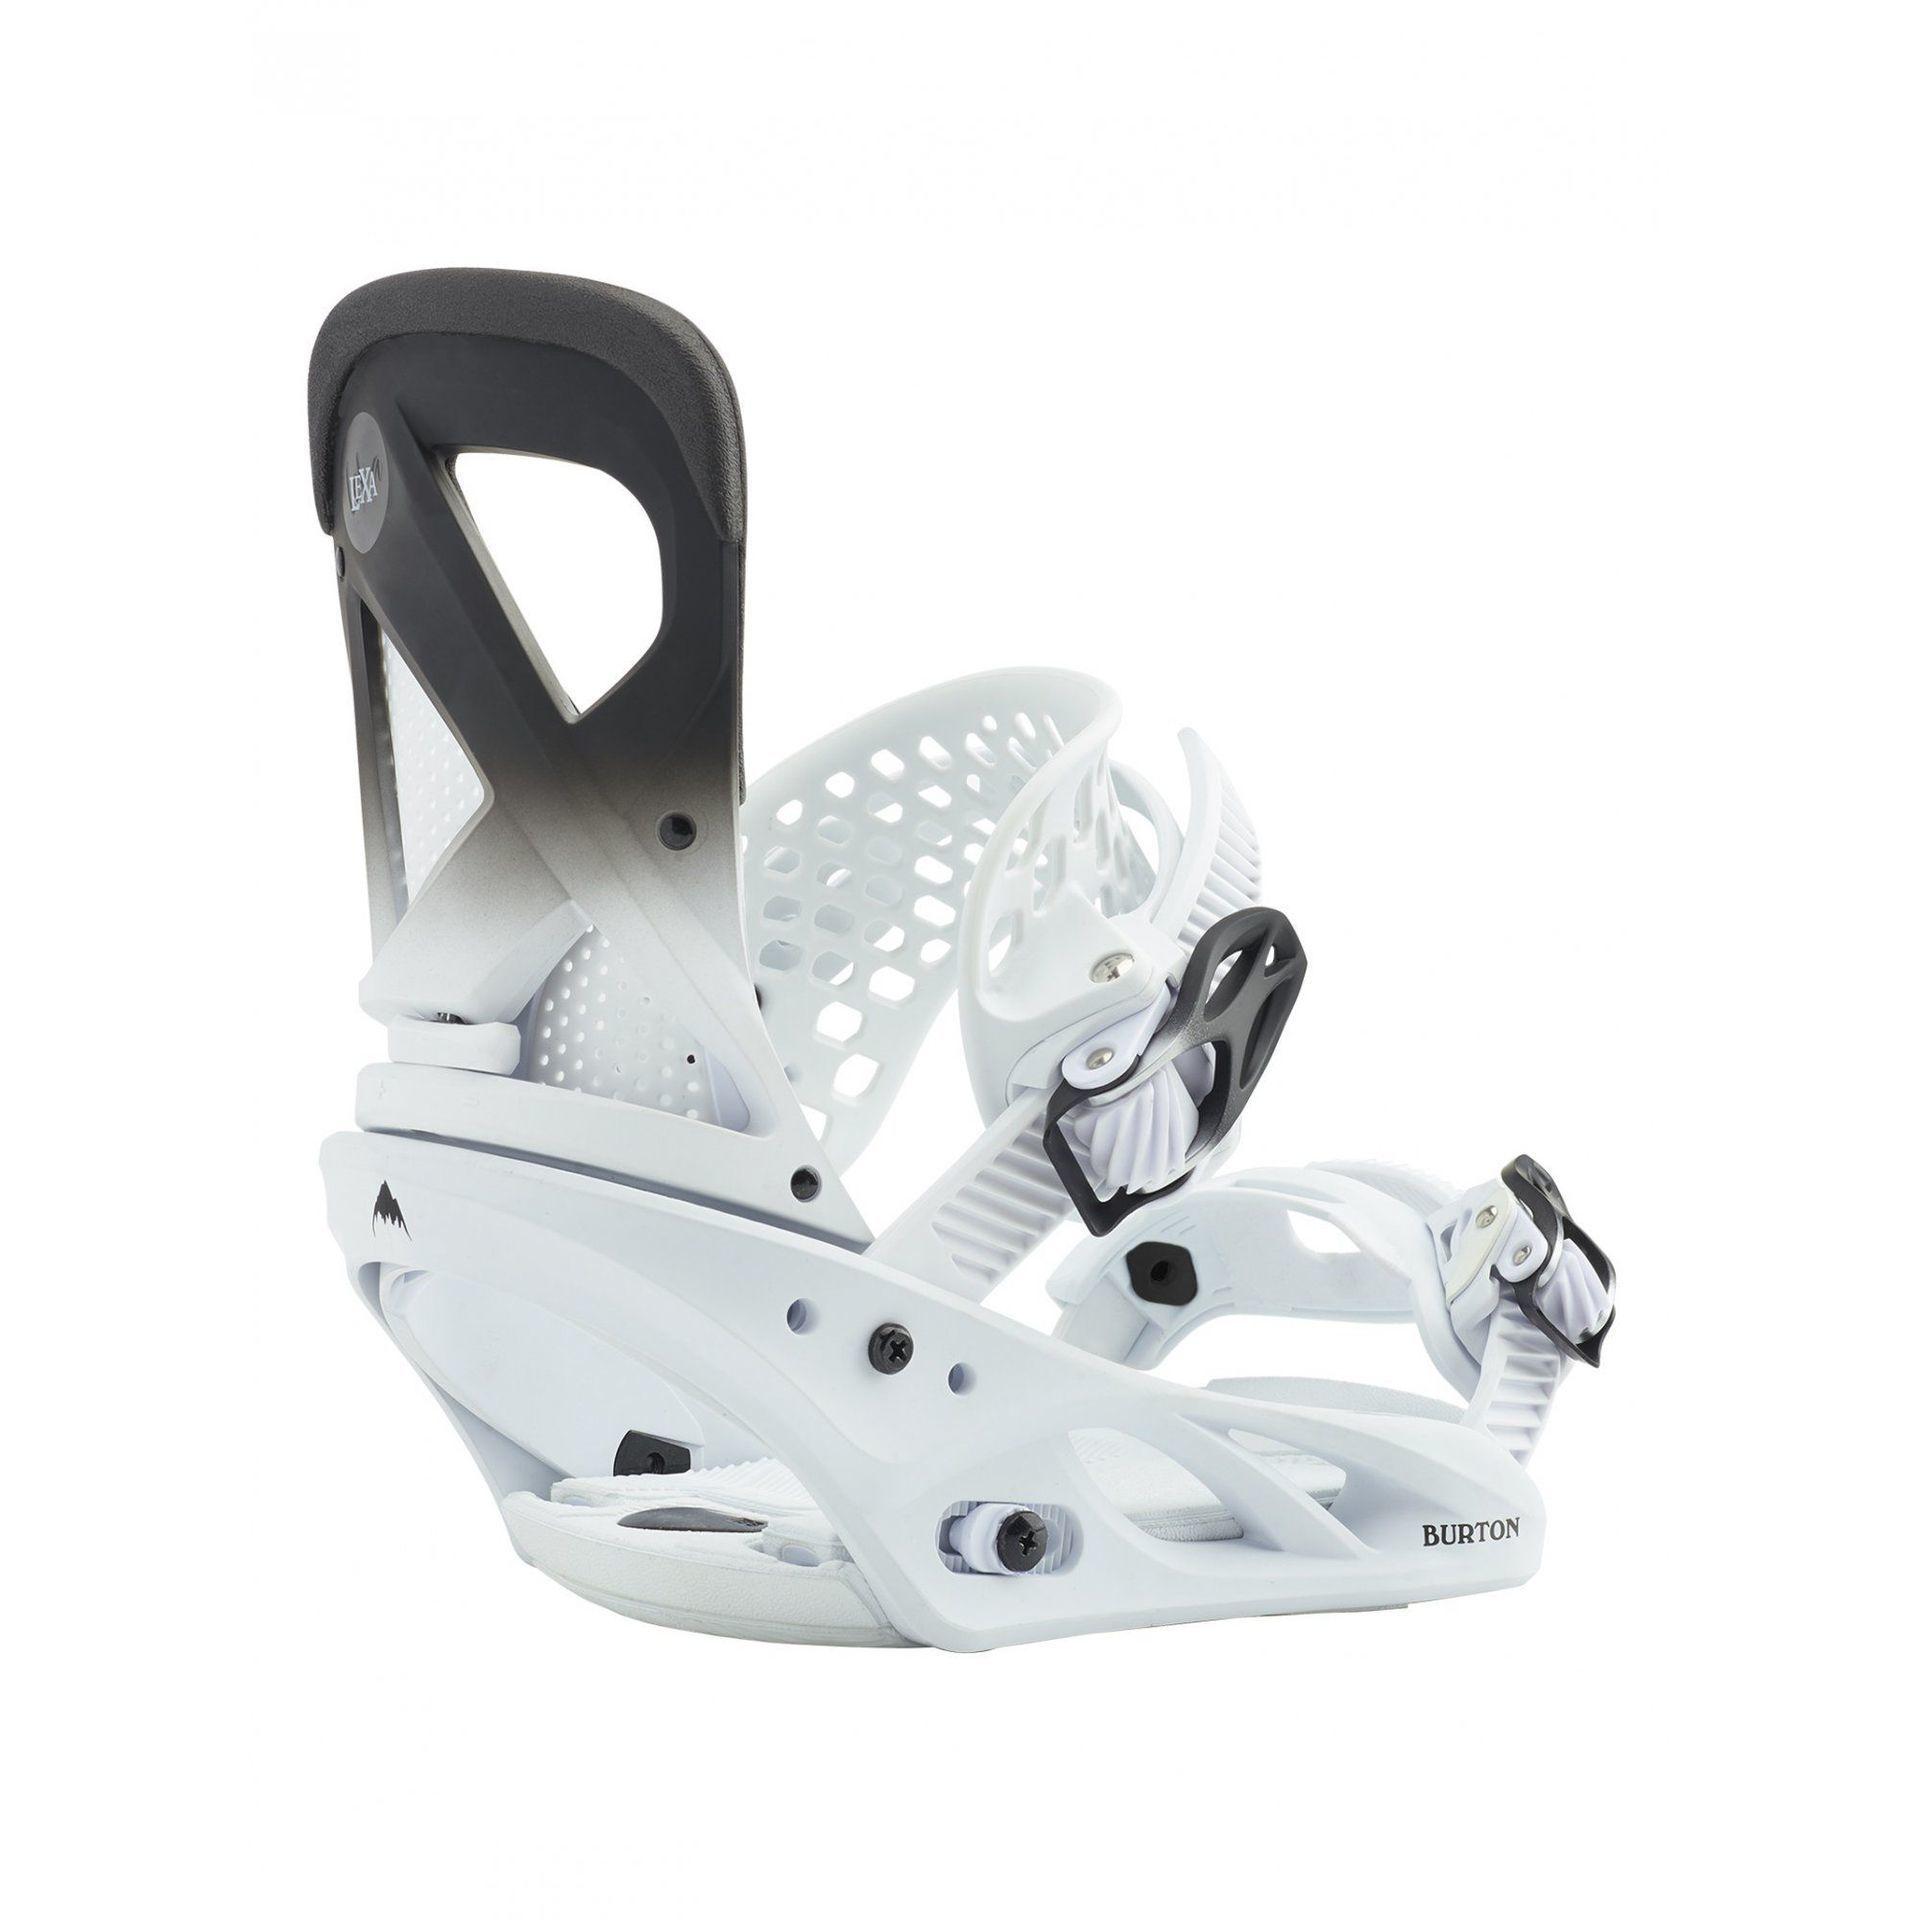 WIĄZANIA SNOWBOARDOWE BURTON LEXA FADE TO WHITE 105451-102 1